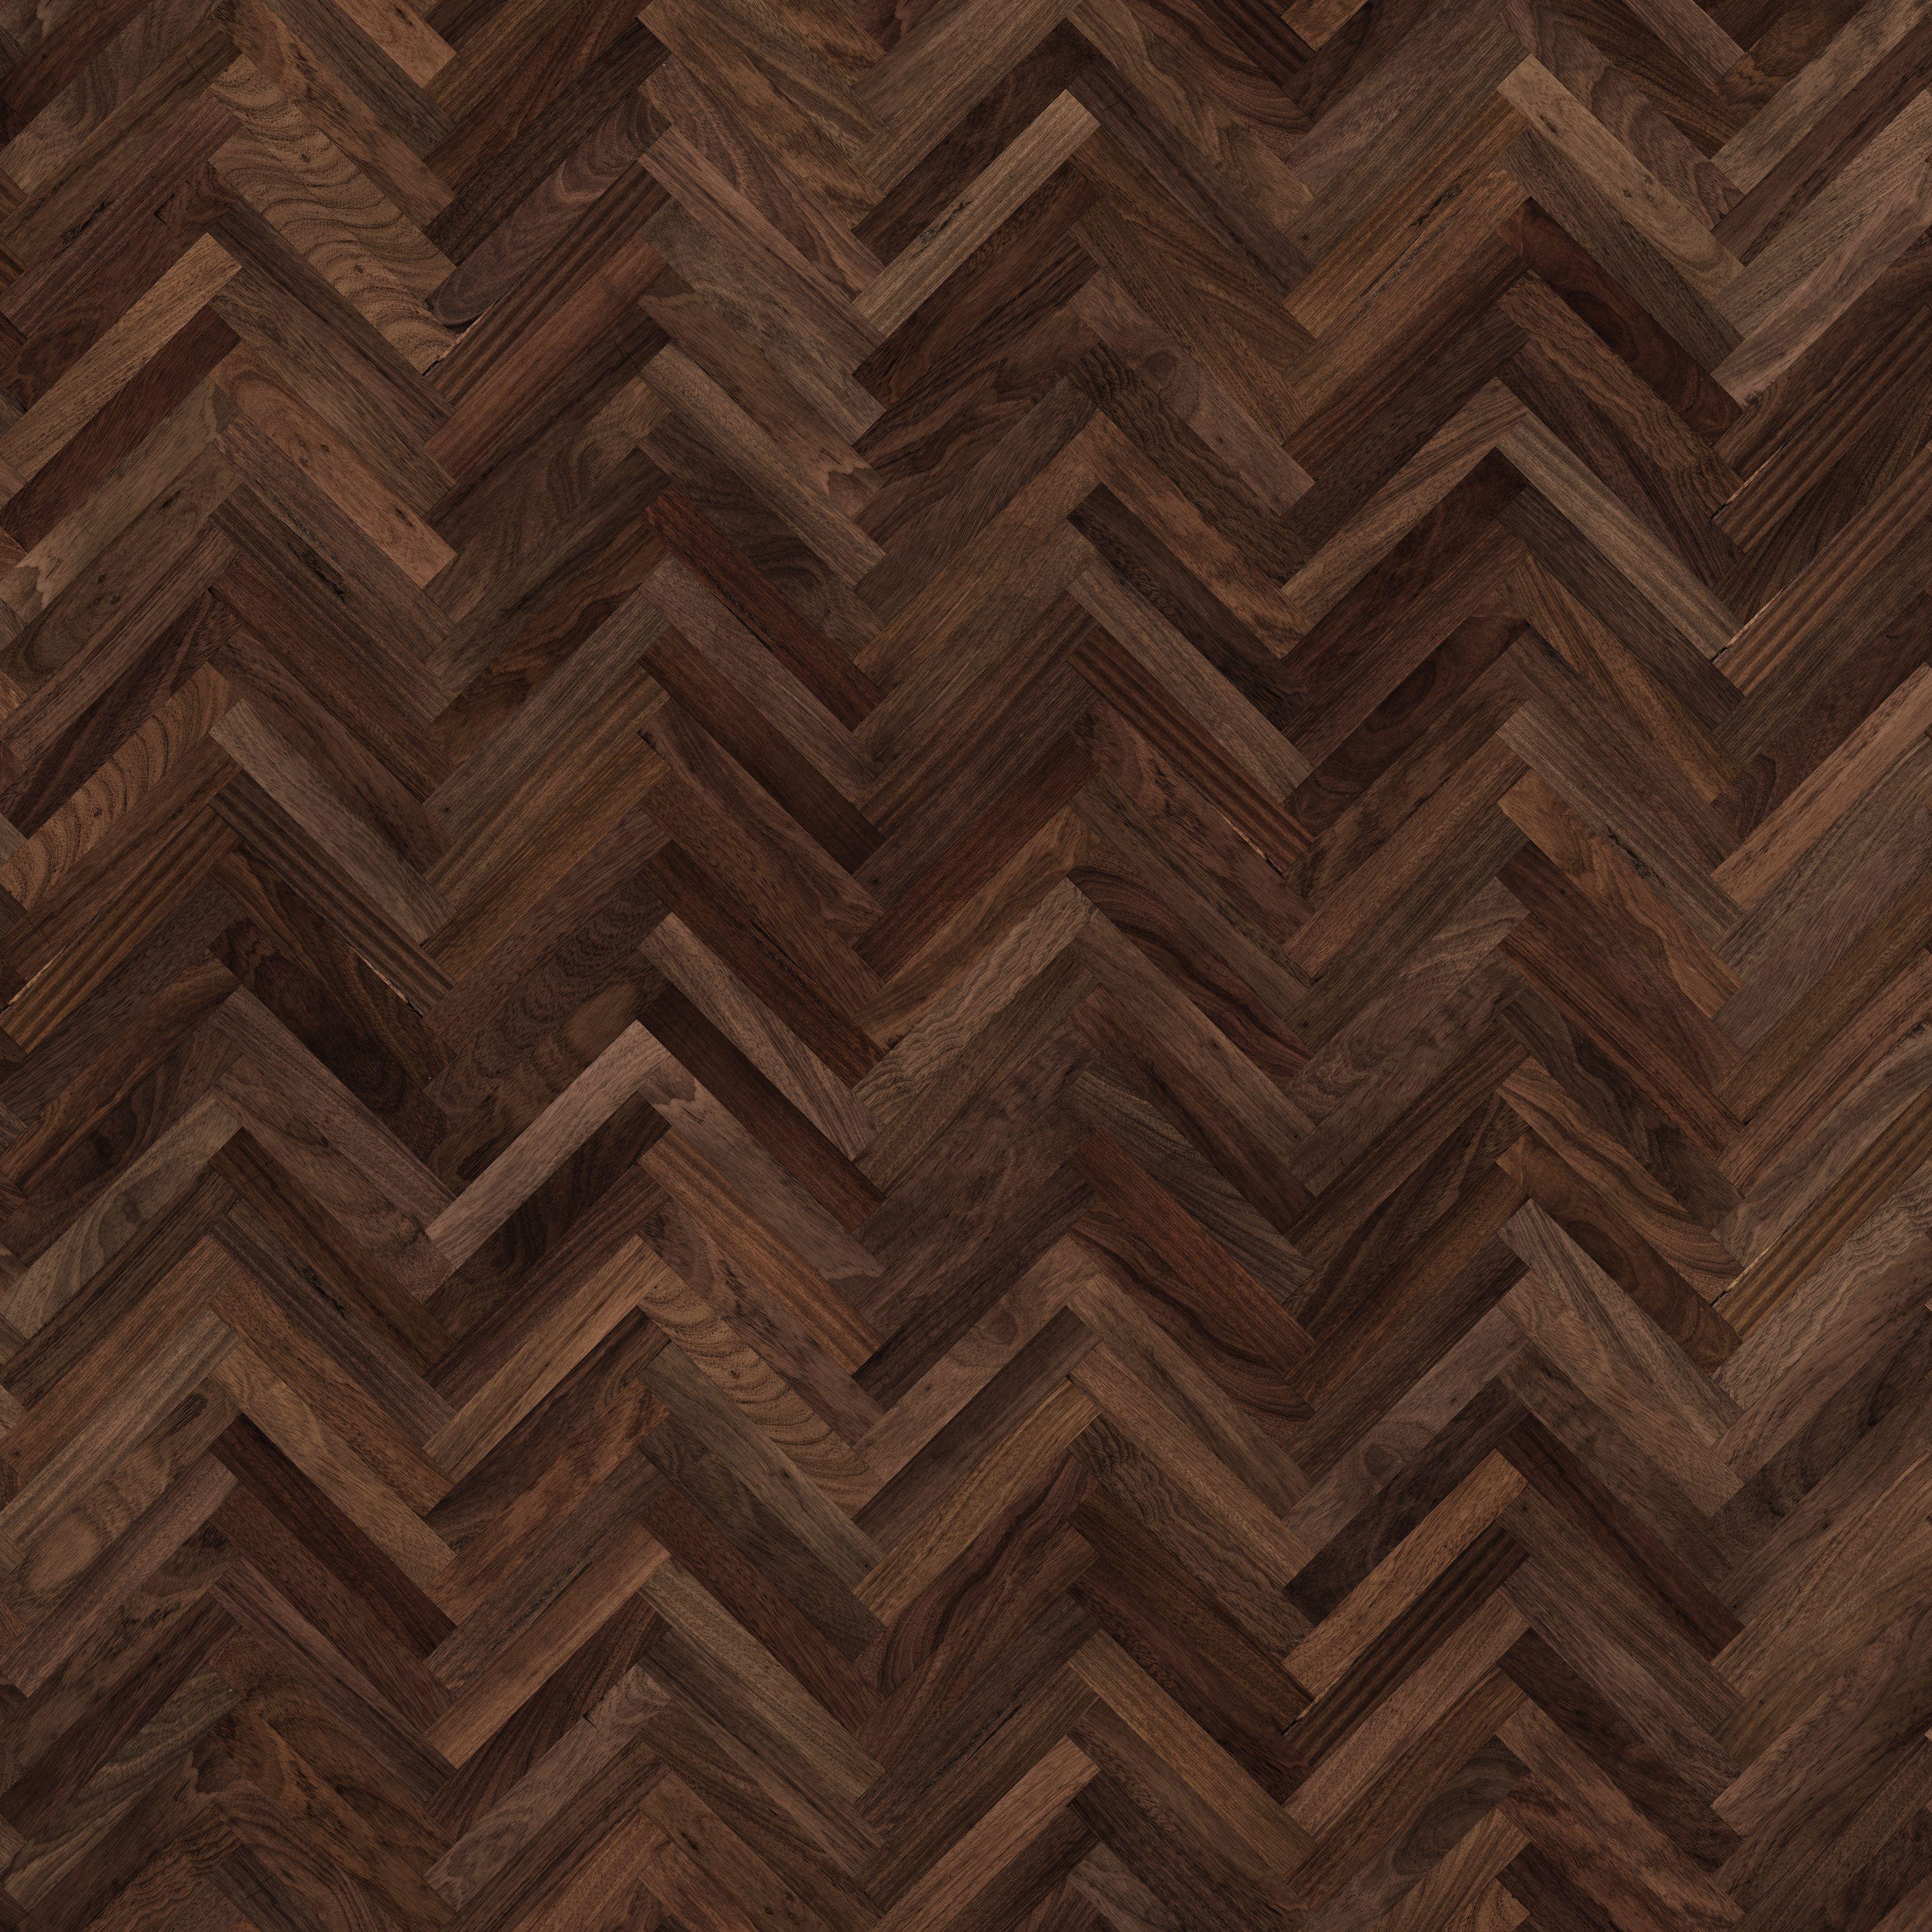 hardwood flooring kalispell of parquet wood flooring with regard to dark brown wood background xxxl 171110782 587c06b75f9b584db316fb21